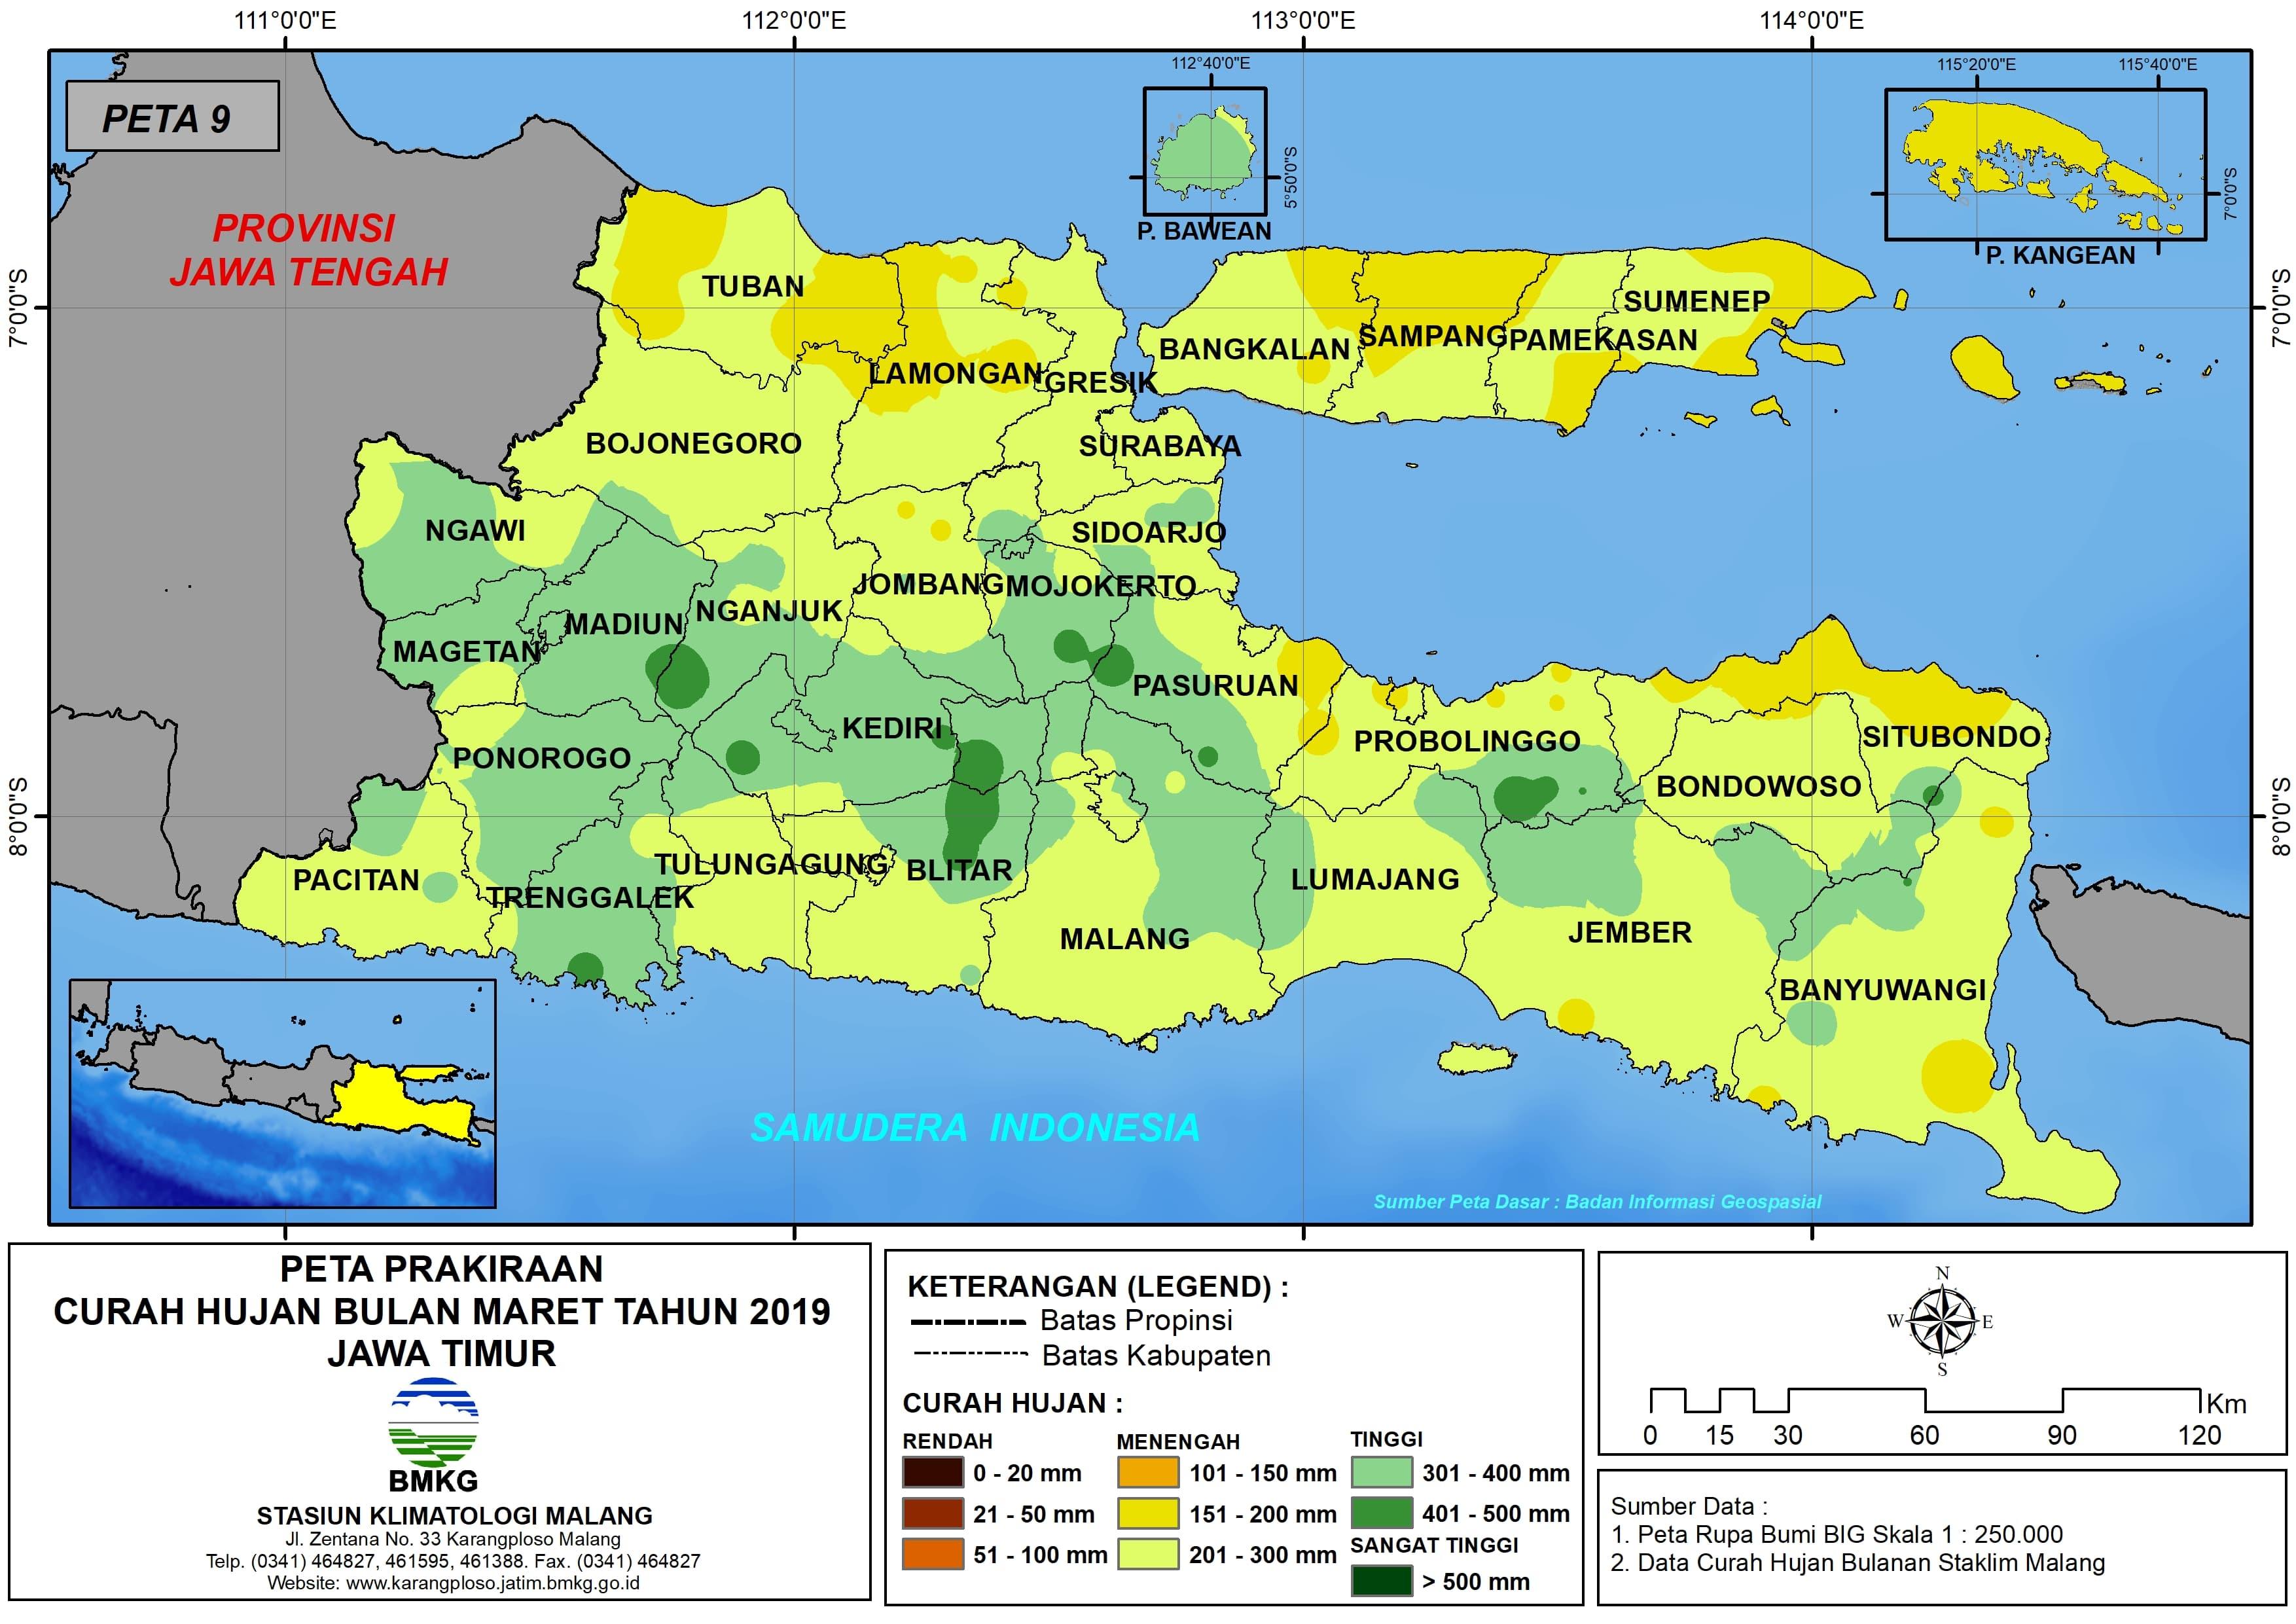 Prakiraan Curah Hujan Bulan Maret Tahun 2018 di Provinsi Jawa Timur Update dari Analisis Bulan November 2018